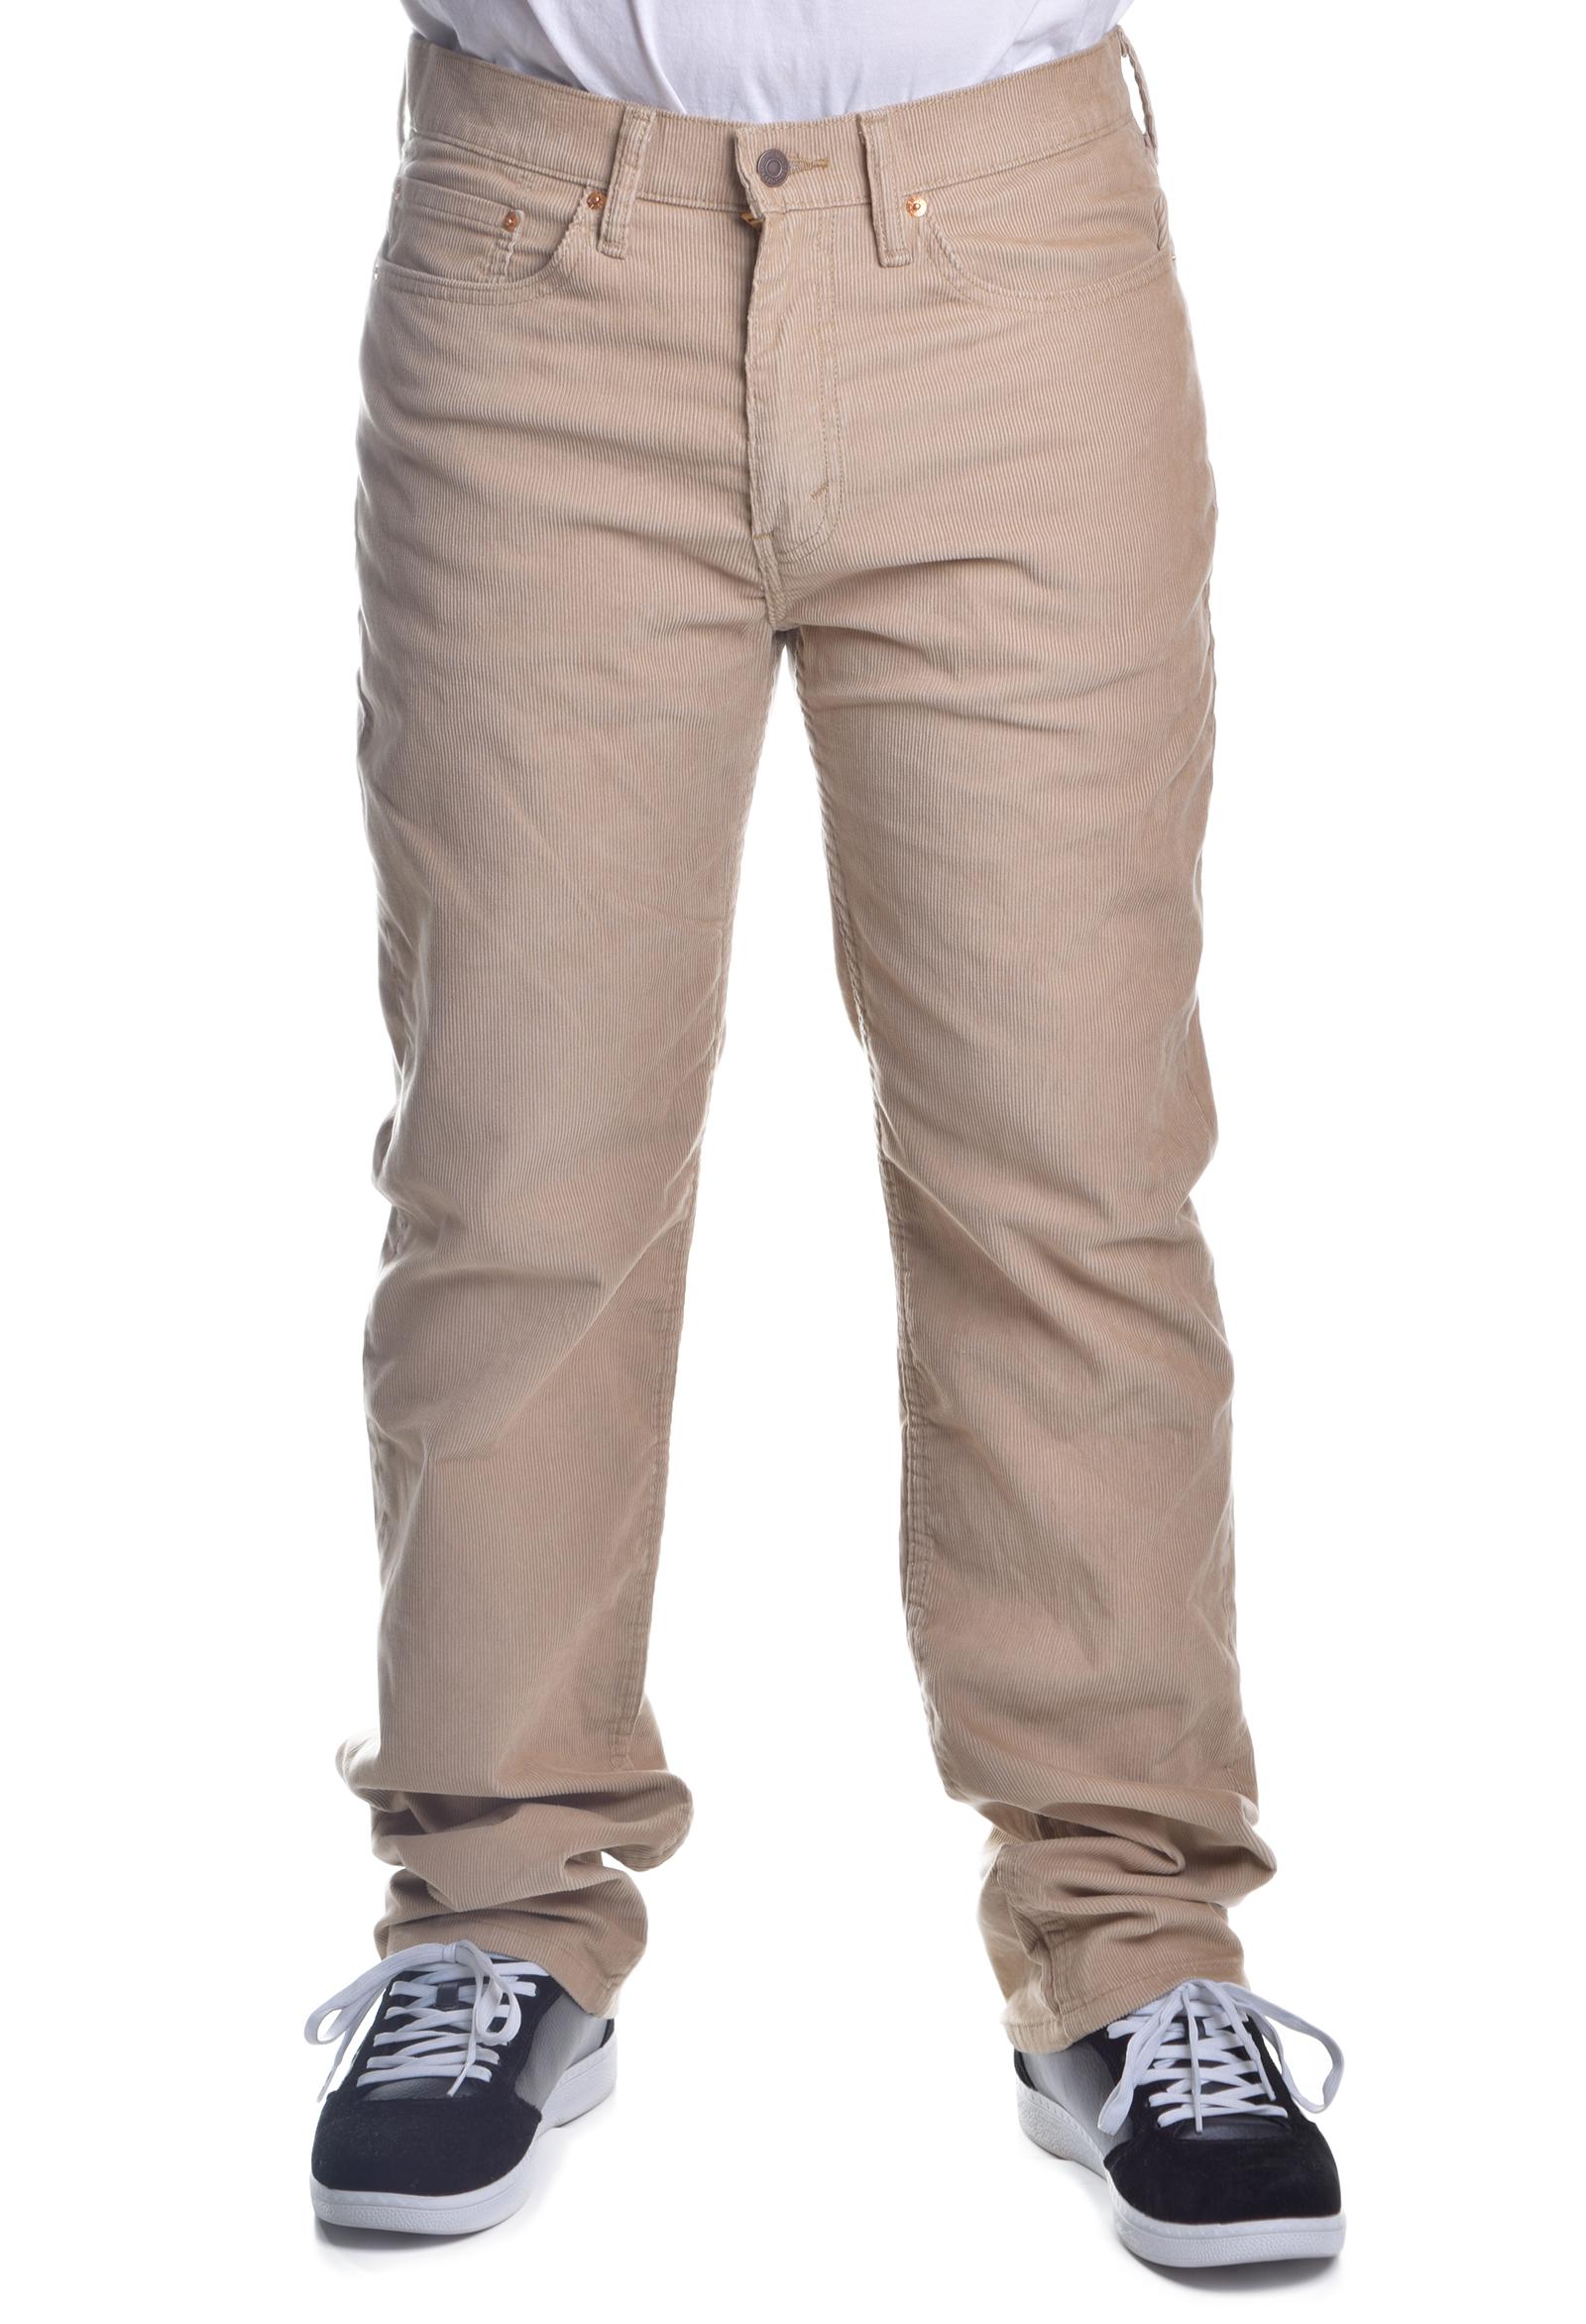 Innovative Leviu0026#39;s Menu0026#39;s 514 Straight Fit Corduroy Pants Green Graphite Black Beige Tan NWT | EBay